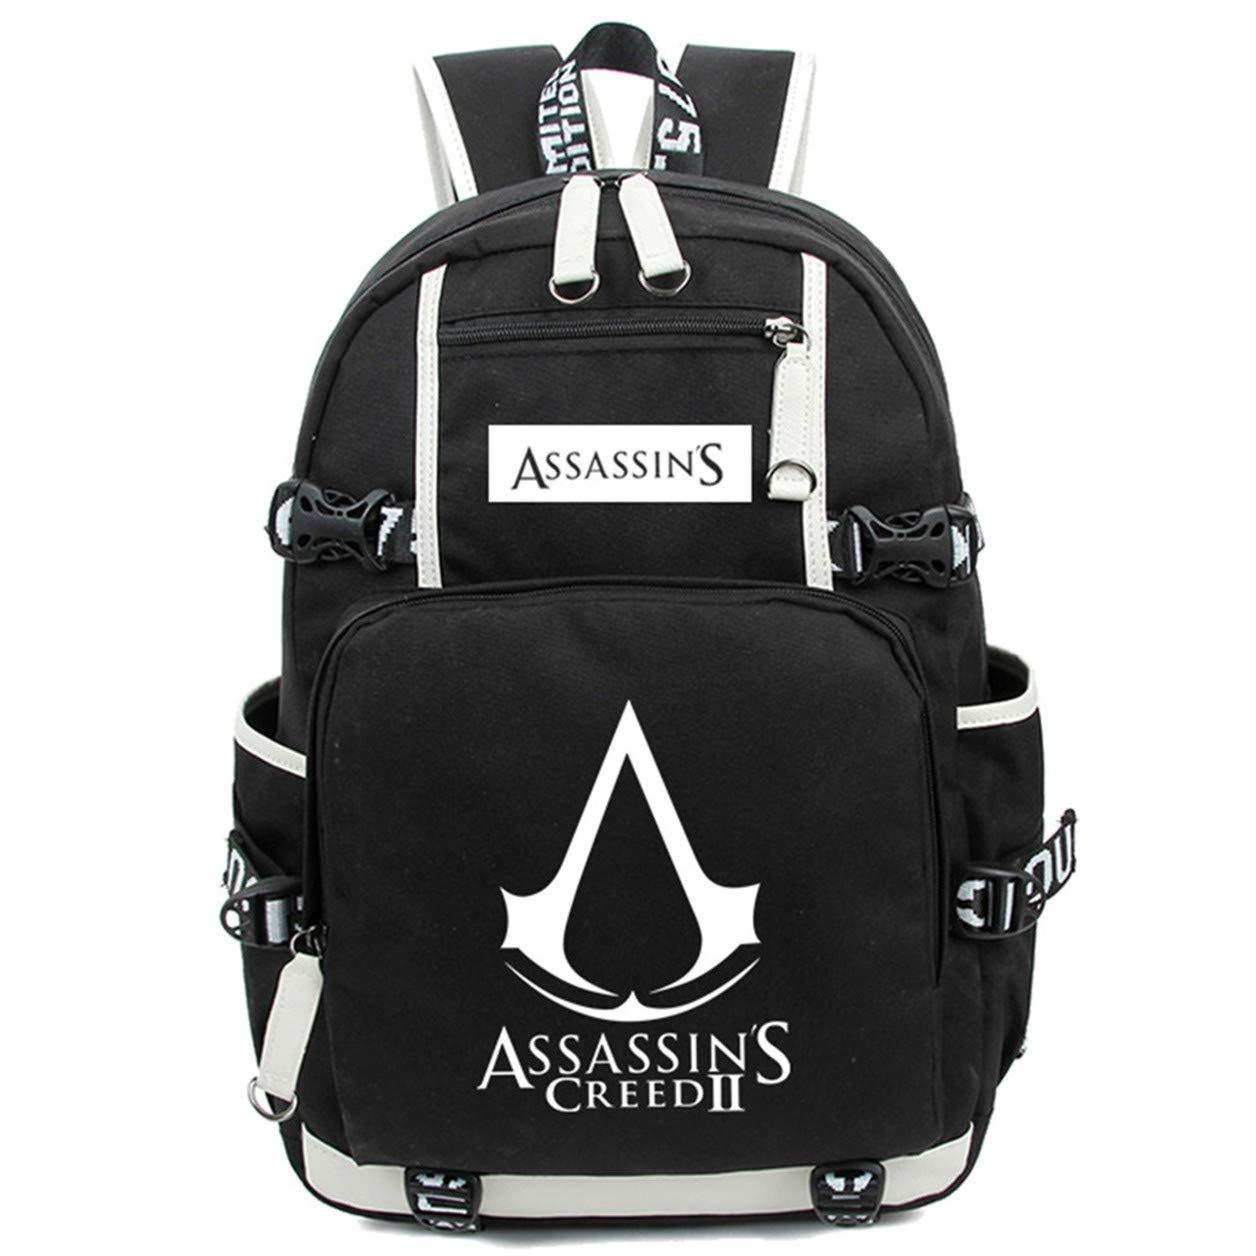 Amazon.com: AUGYUESS Mochila luminosa para la escuela, bolsa ...